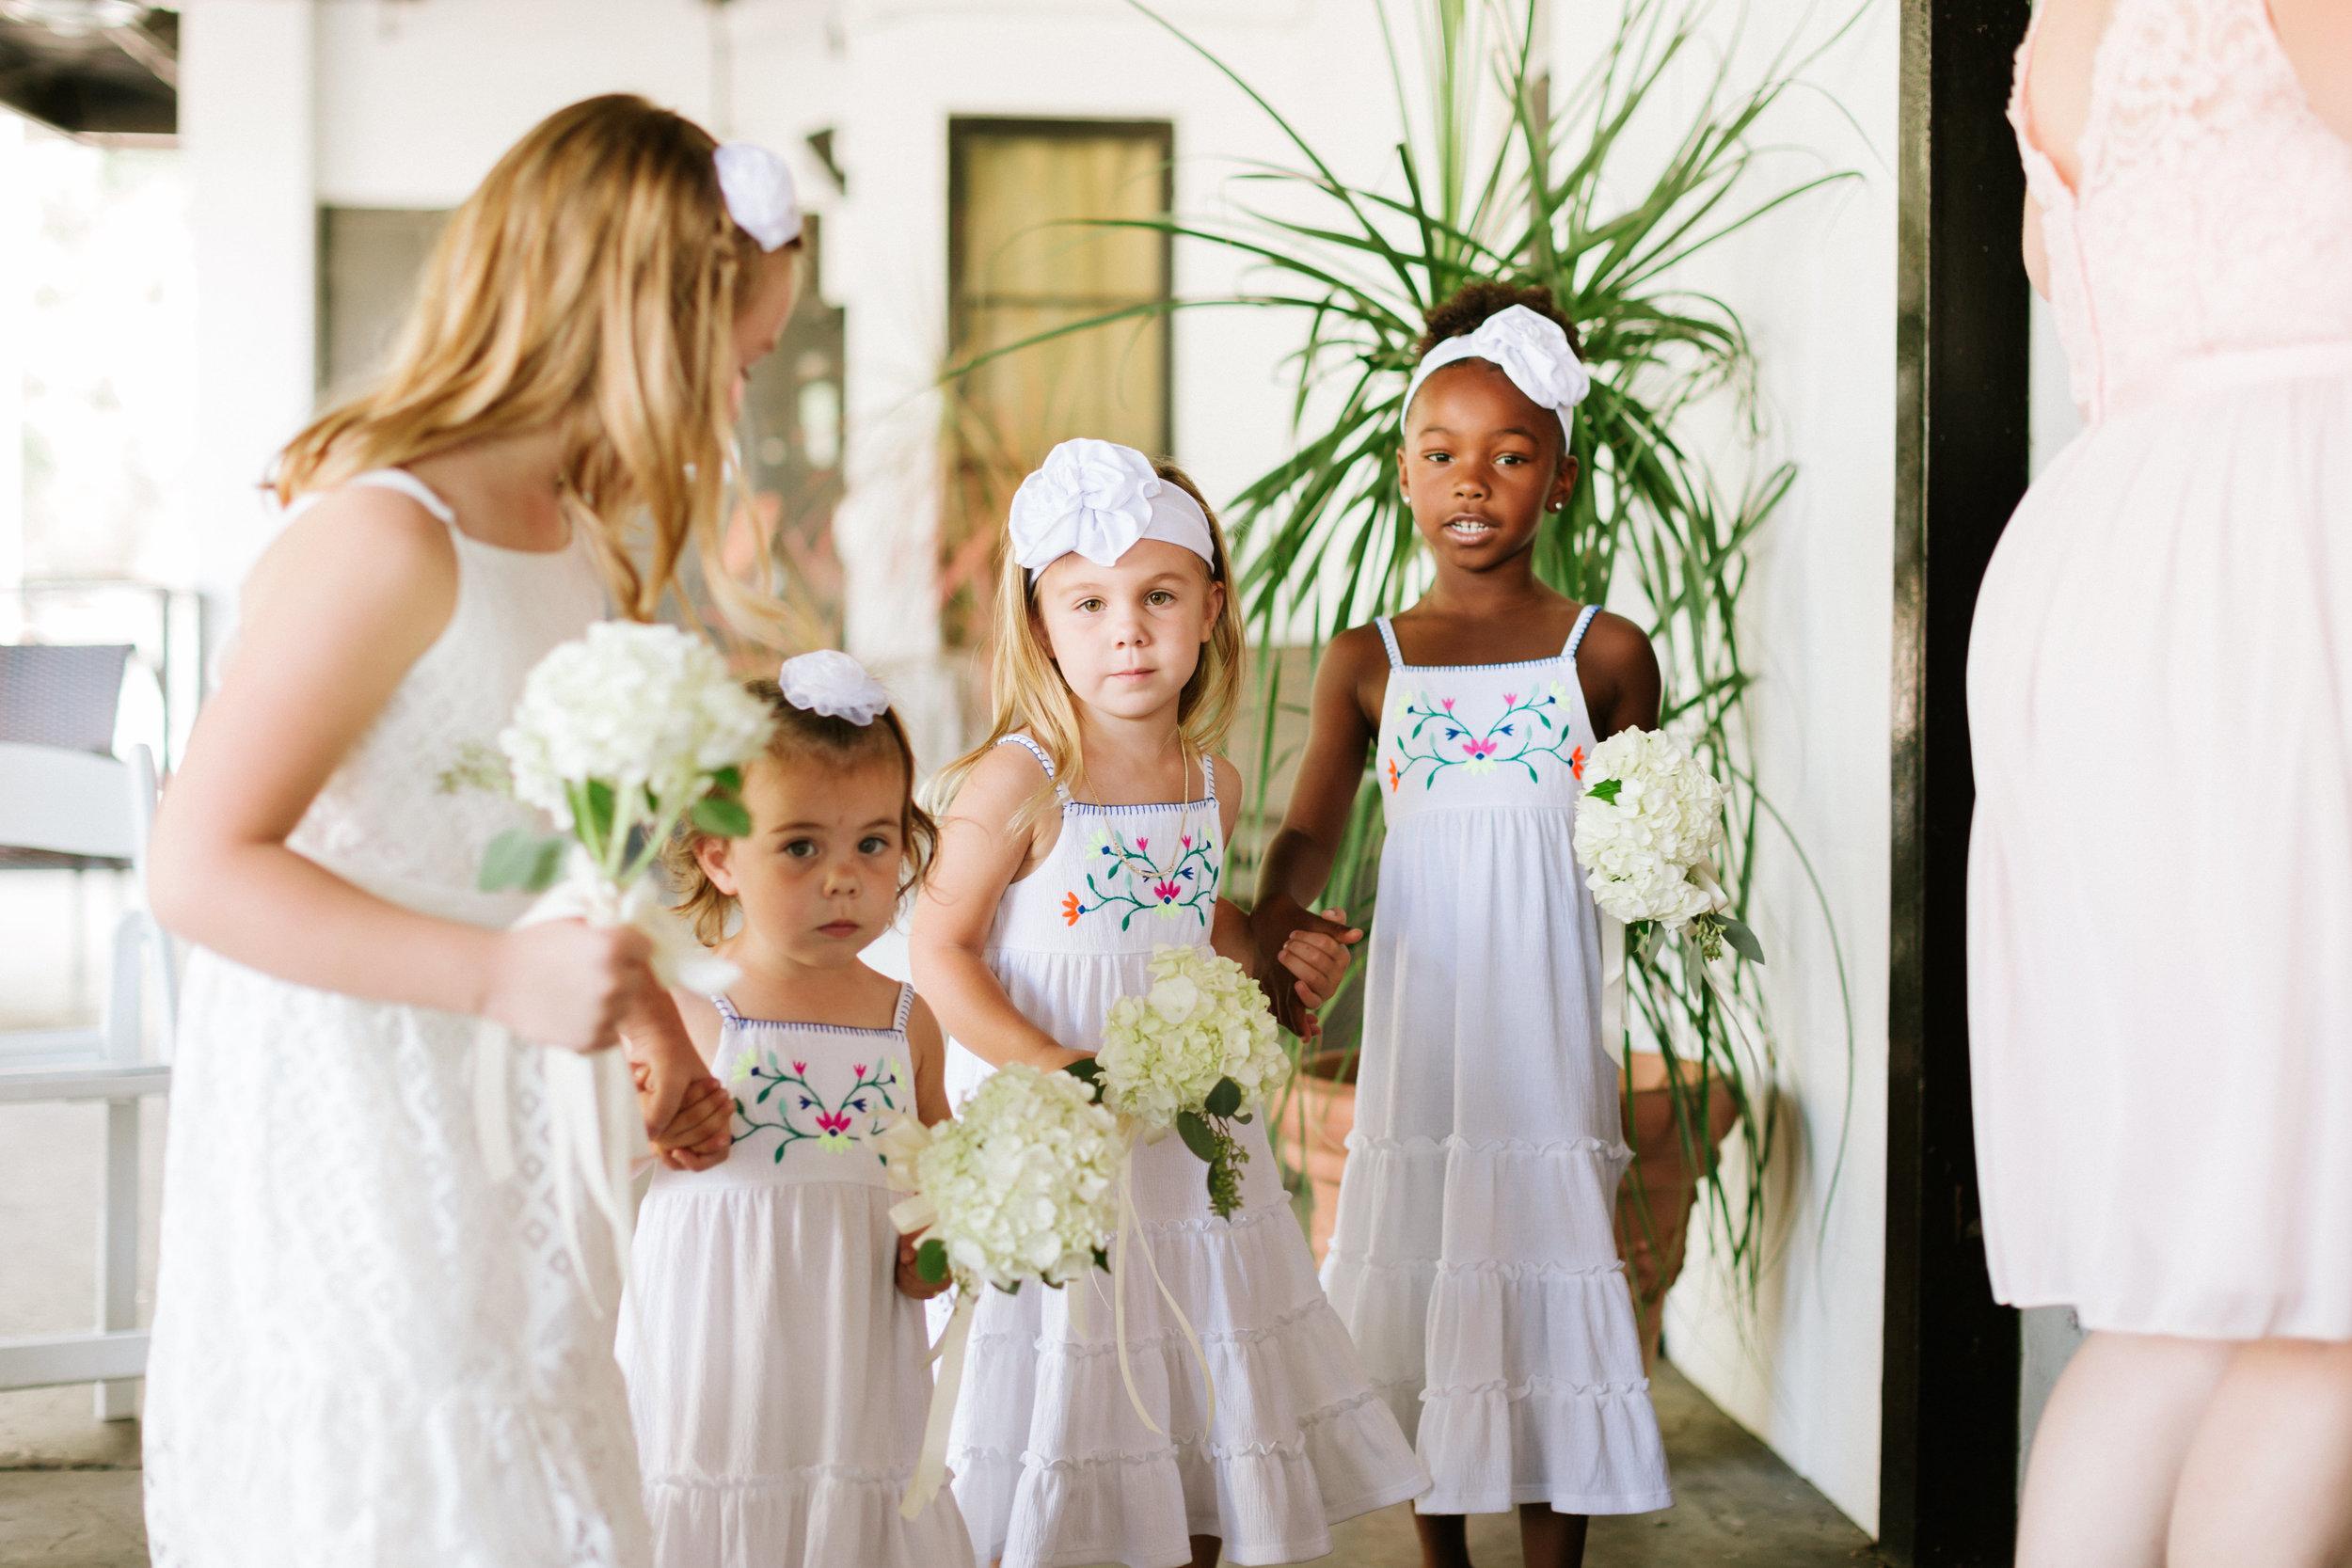 2017.09.16 Ashley and Chuck O'Day Quantam Leap Winery Wedding (116 of 462).jpg